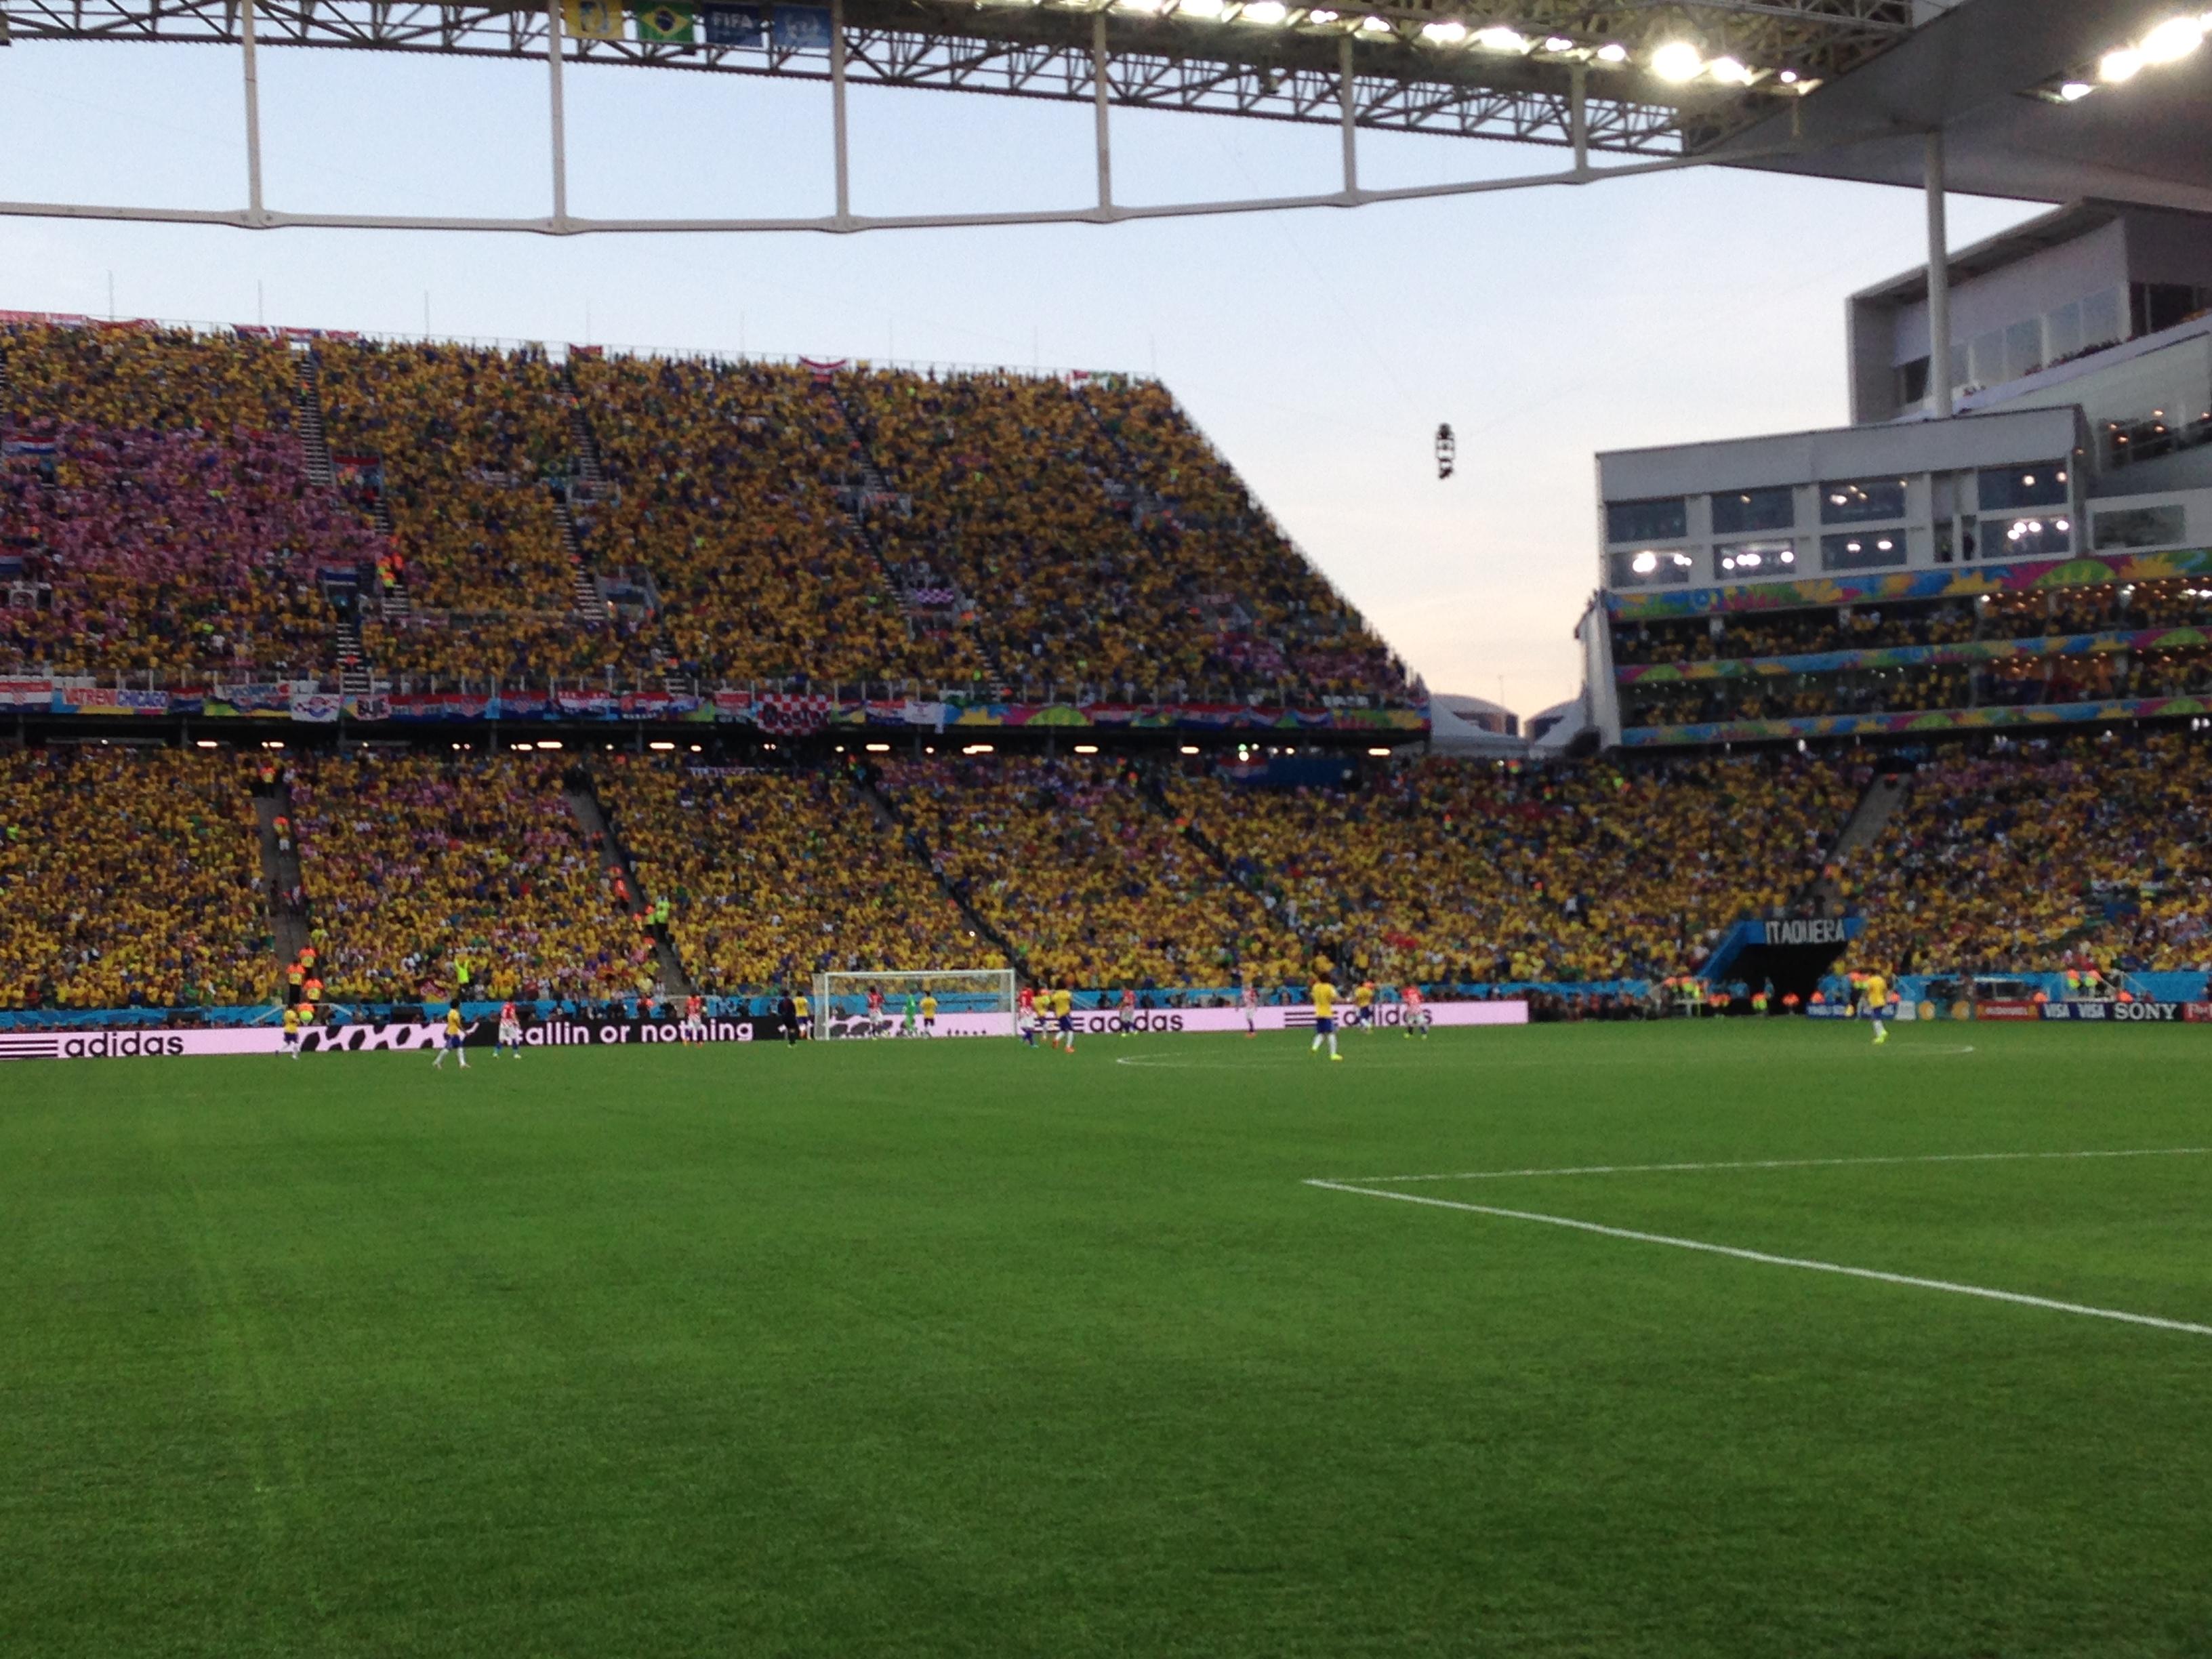 Inaugural Match FIFA World Cup 2014